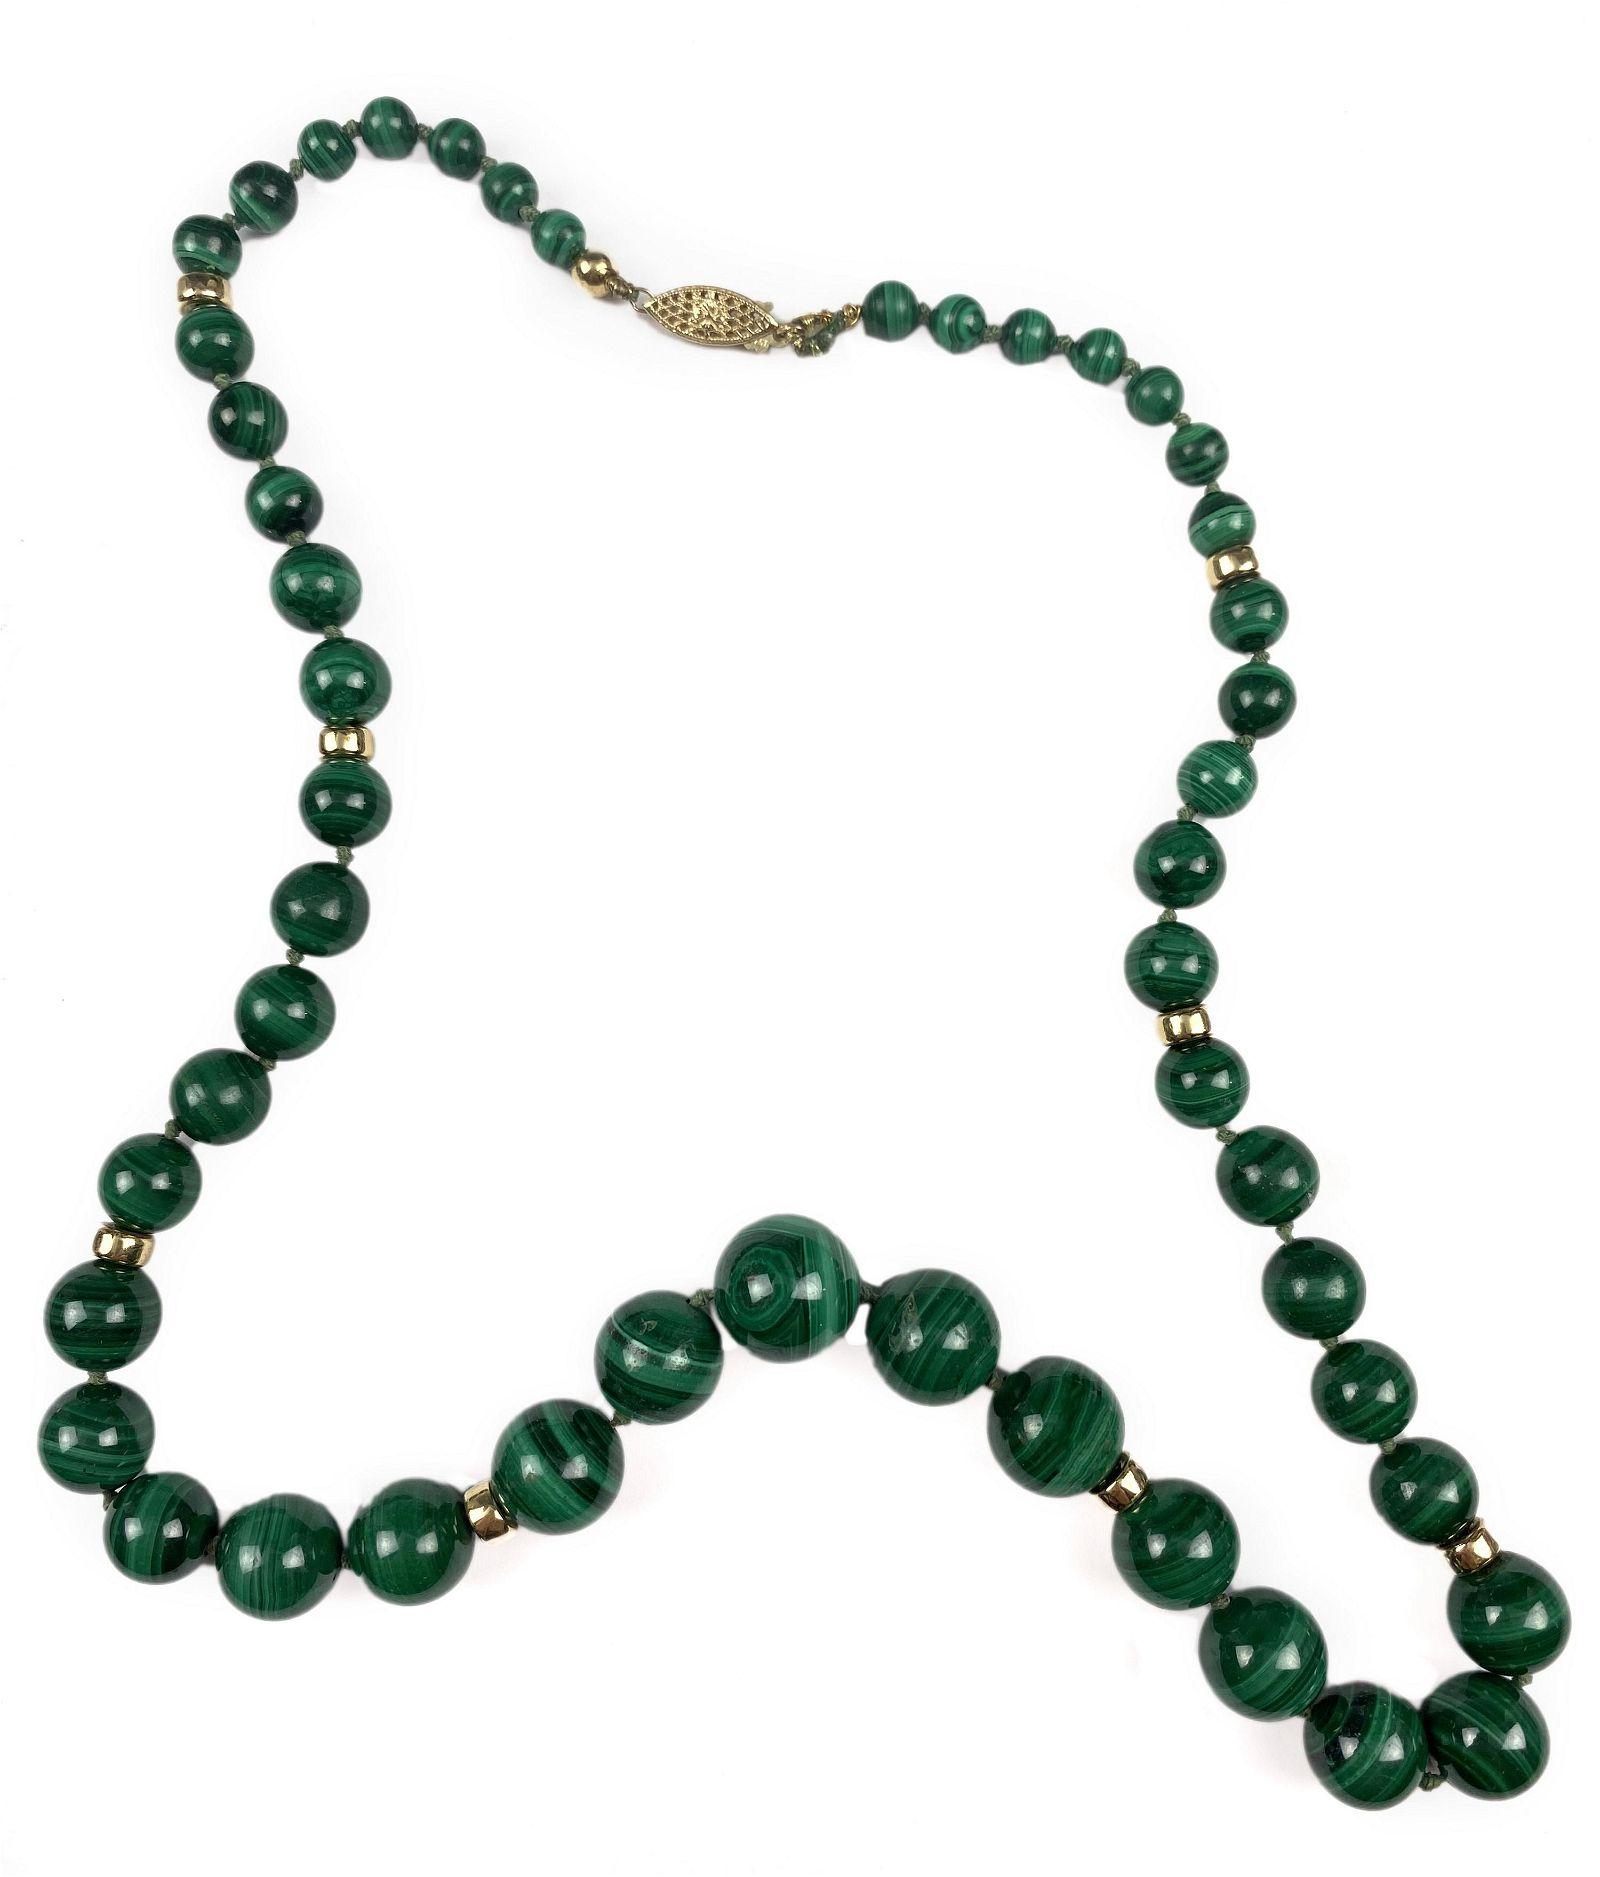 Ladies Vintage 14k Gold Green Malachite Necklace